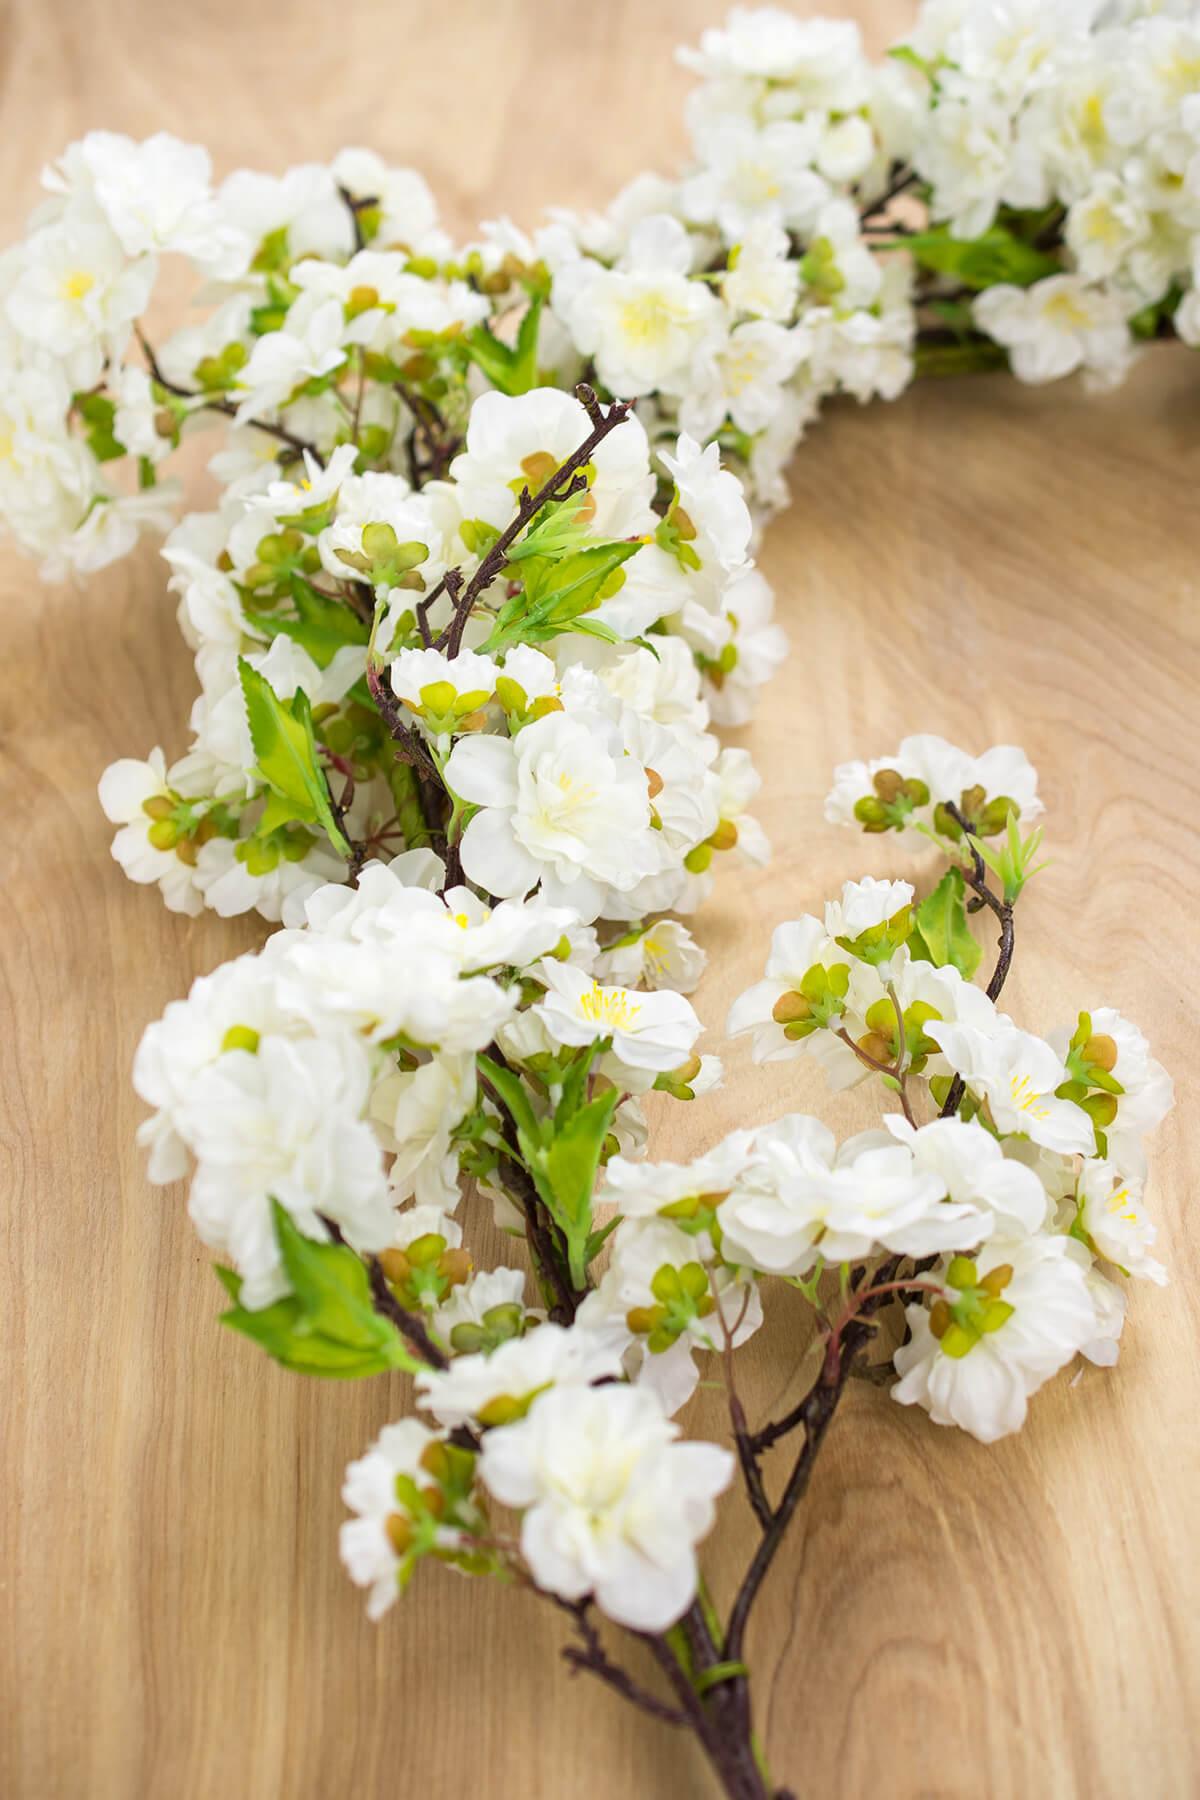 Deluxe White Cherry Blossom Garlands